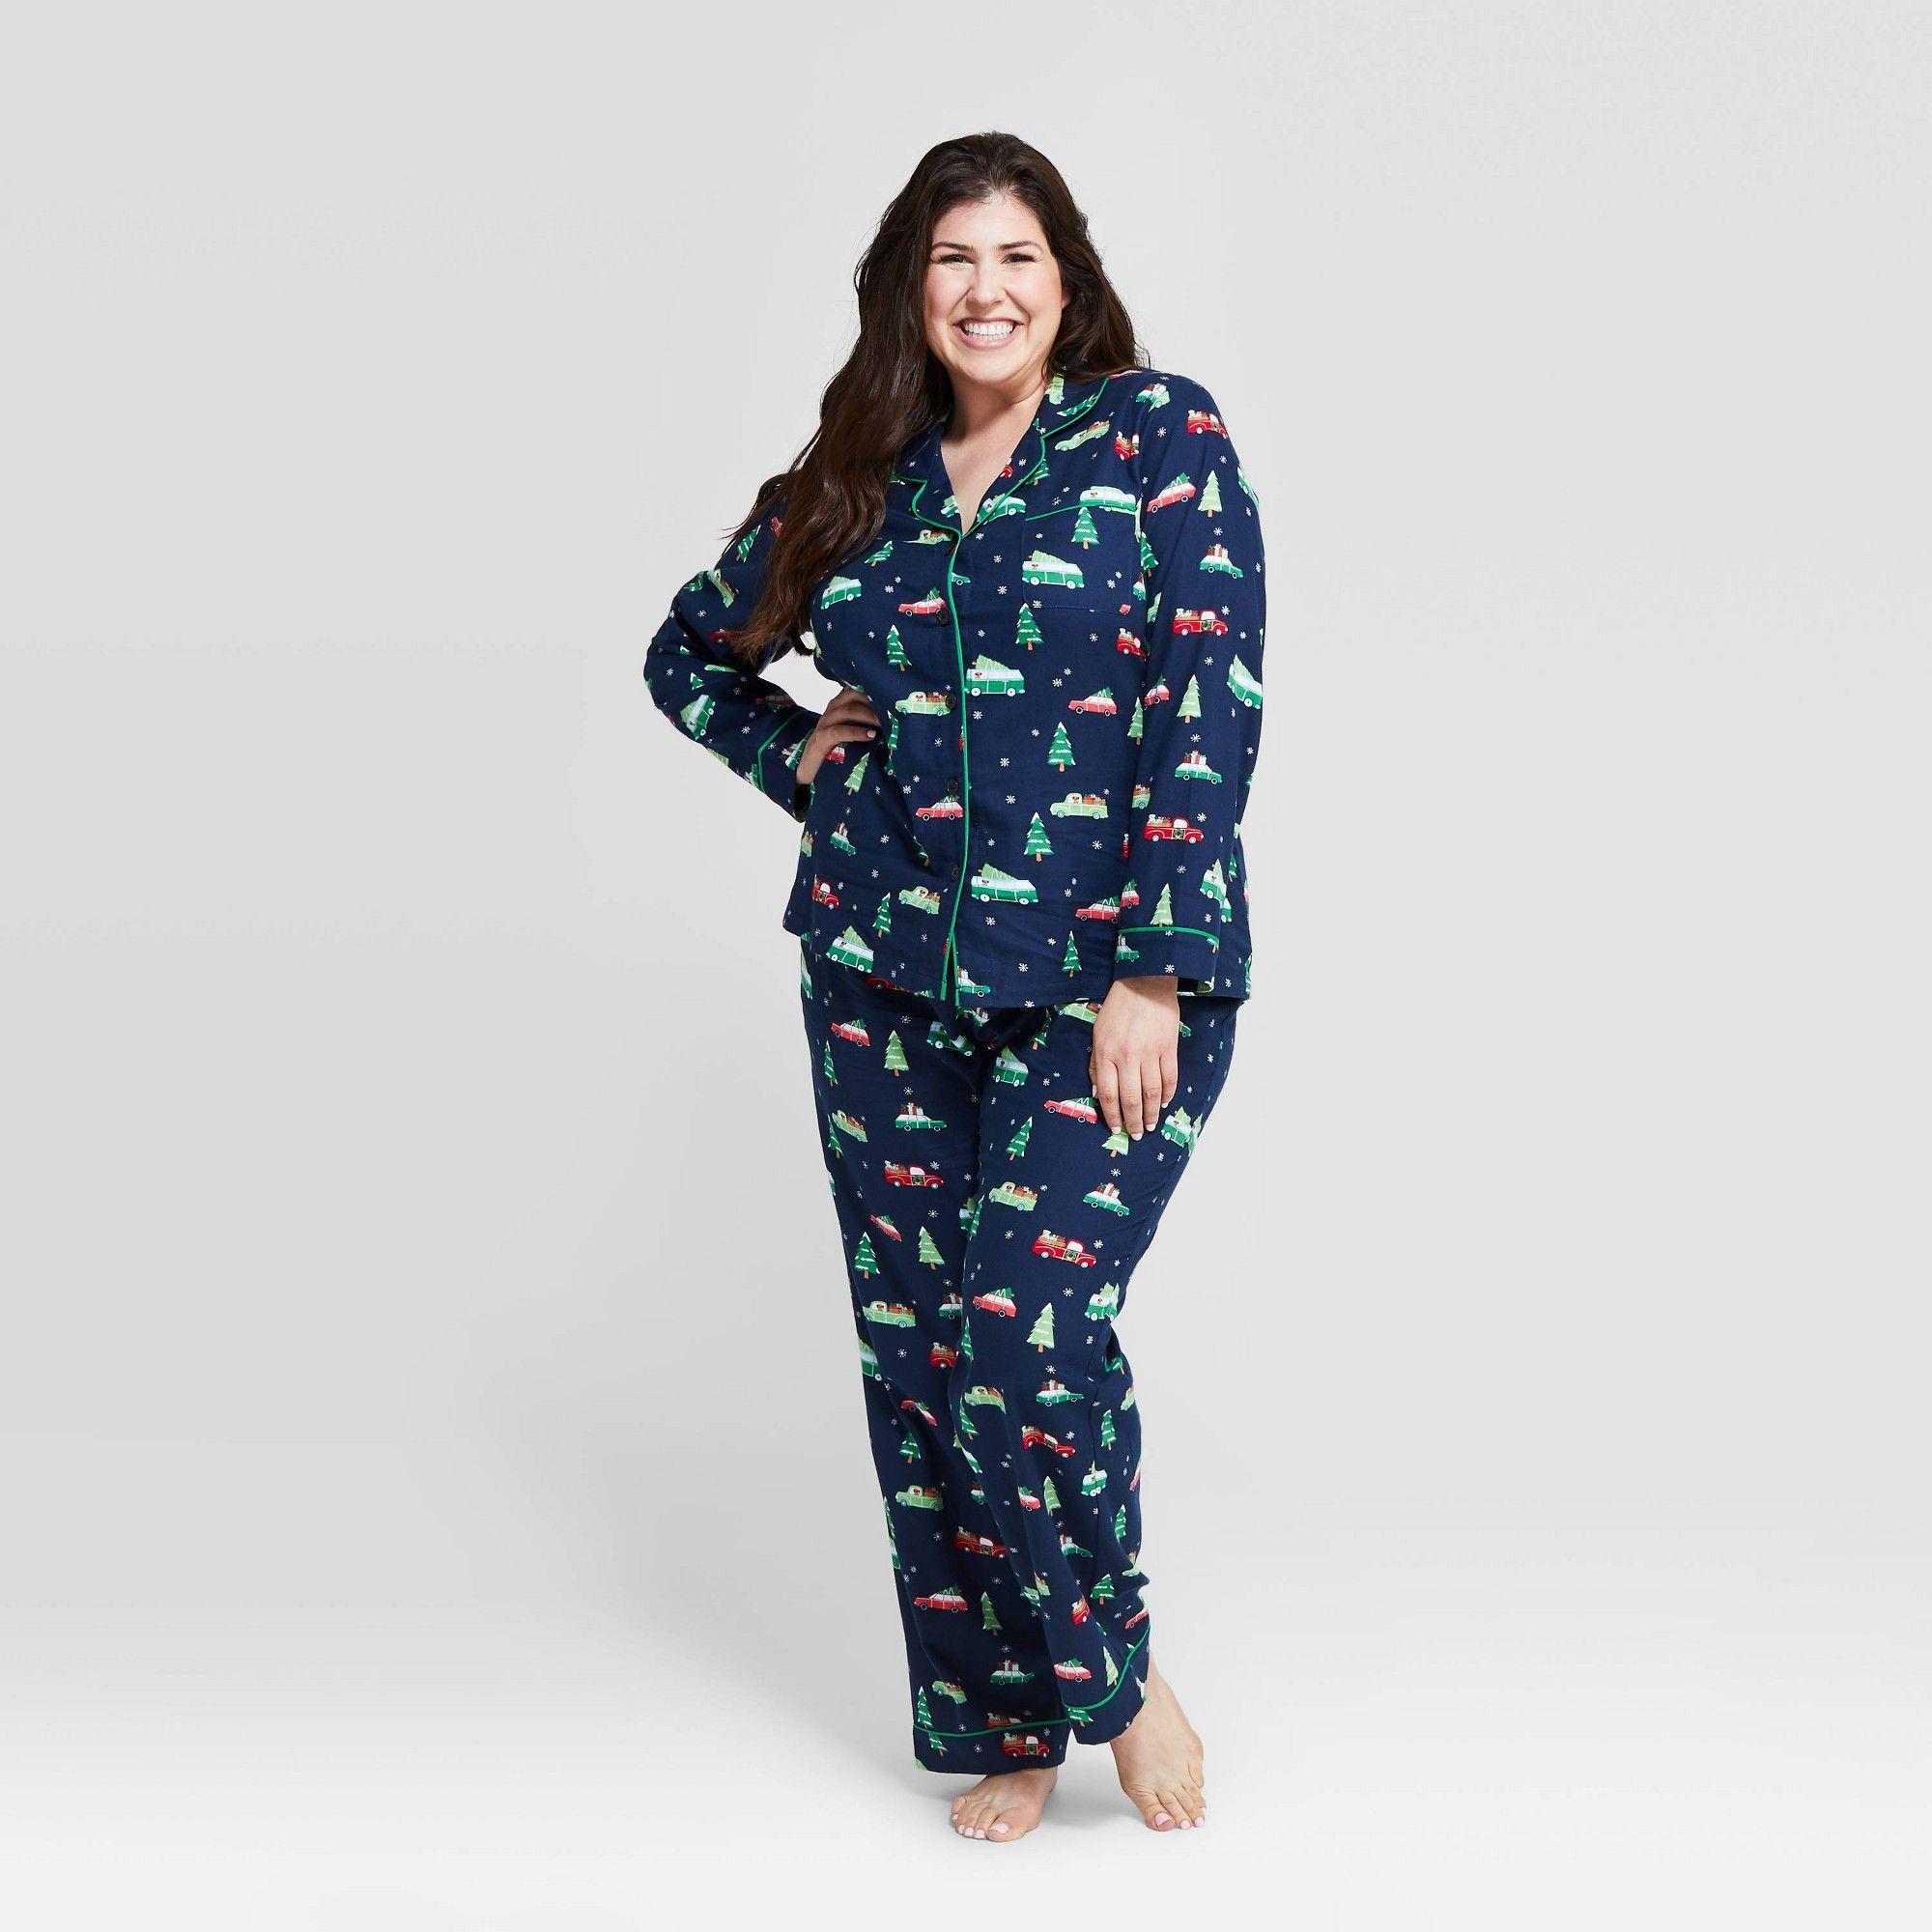 Women's Plus Size Holiday Car Flannel Pajama Set